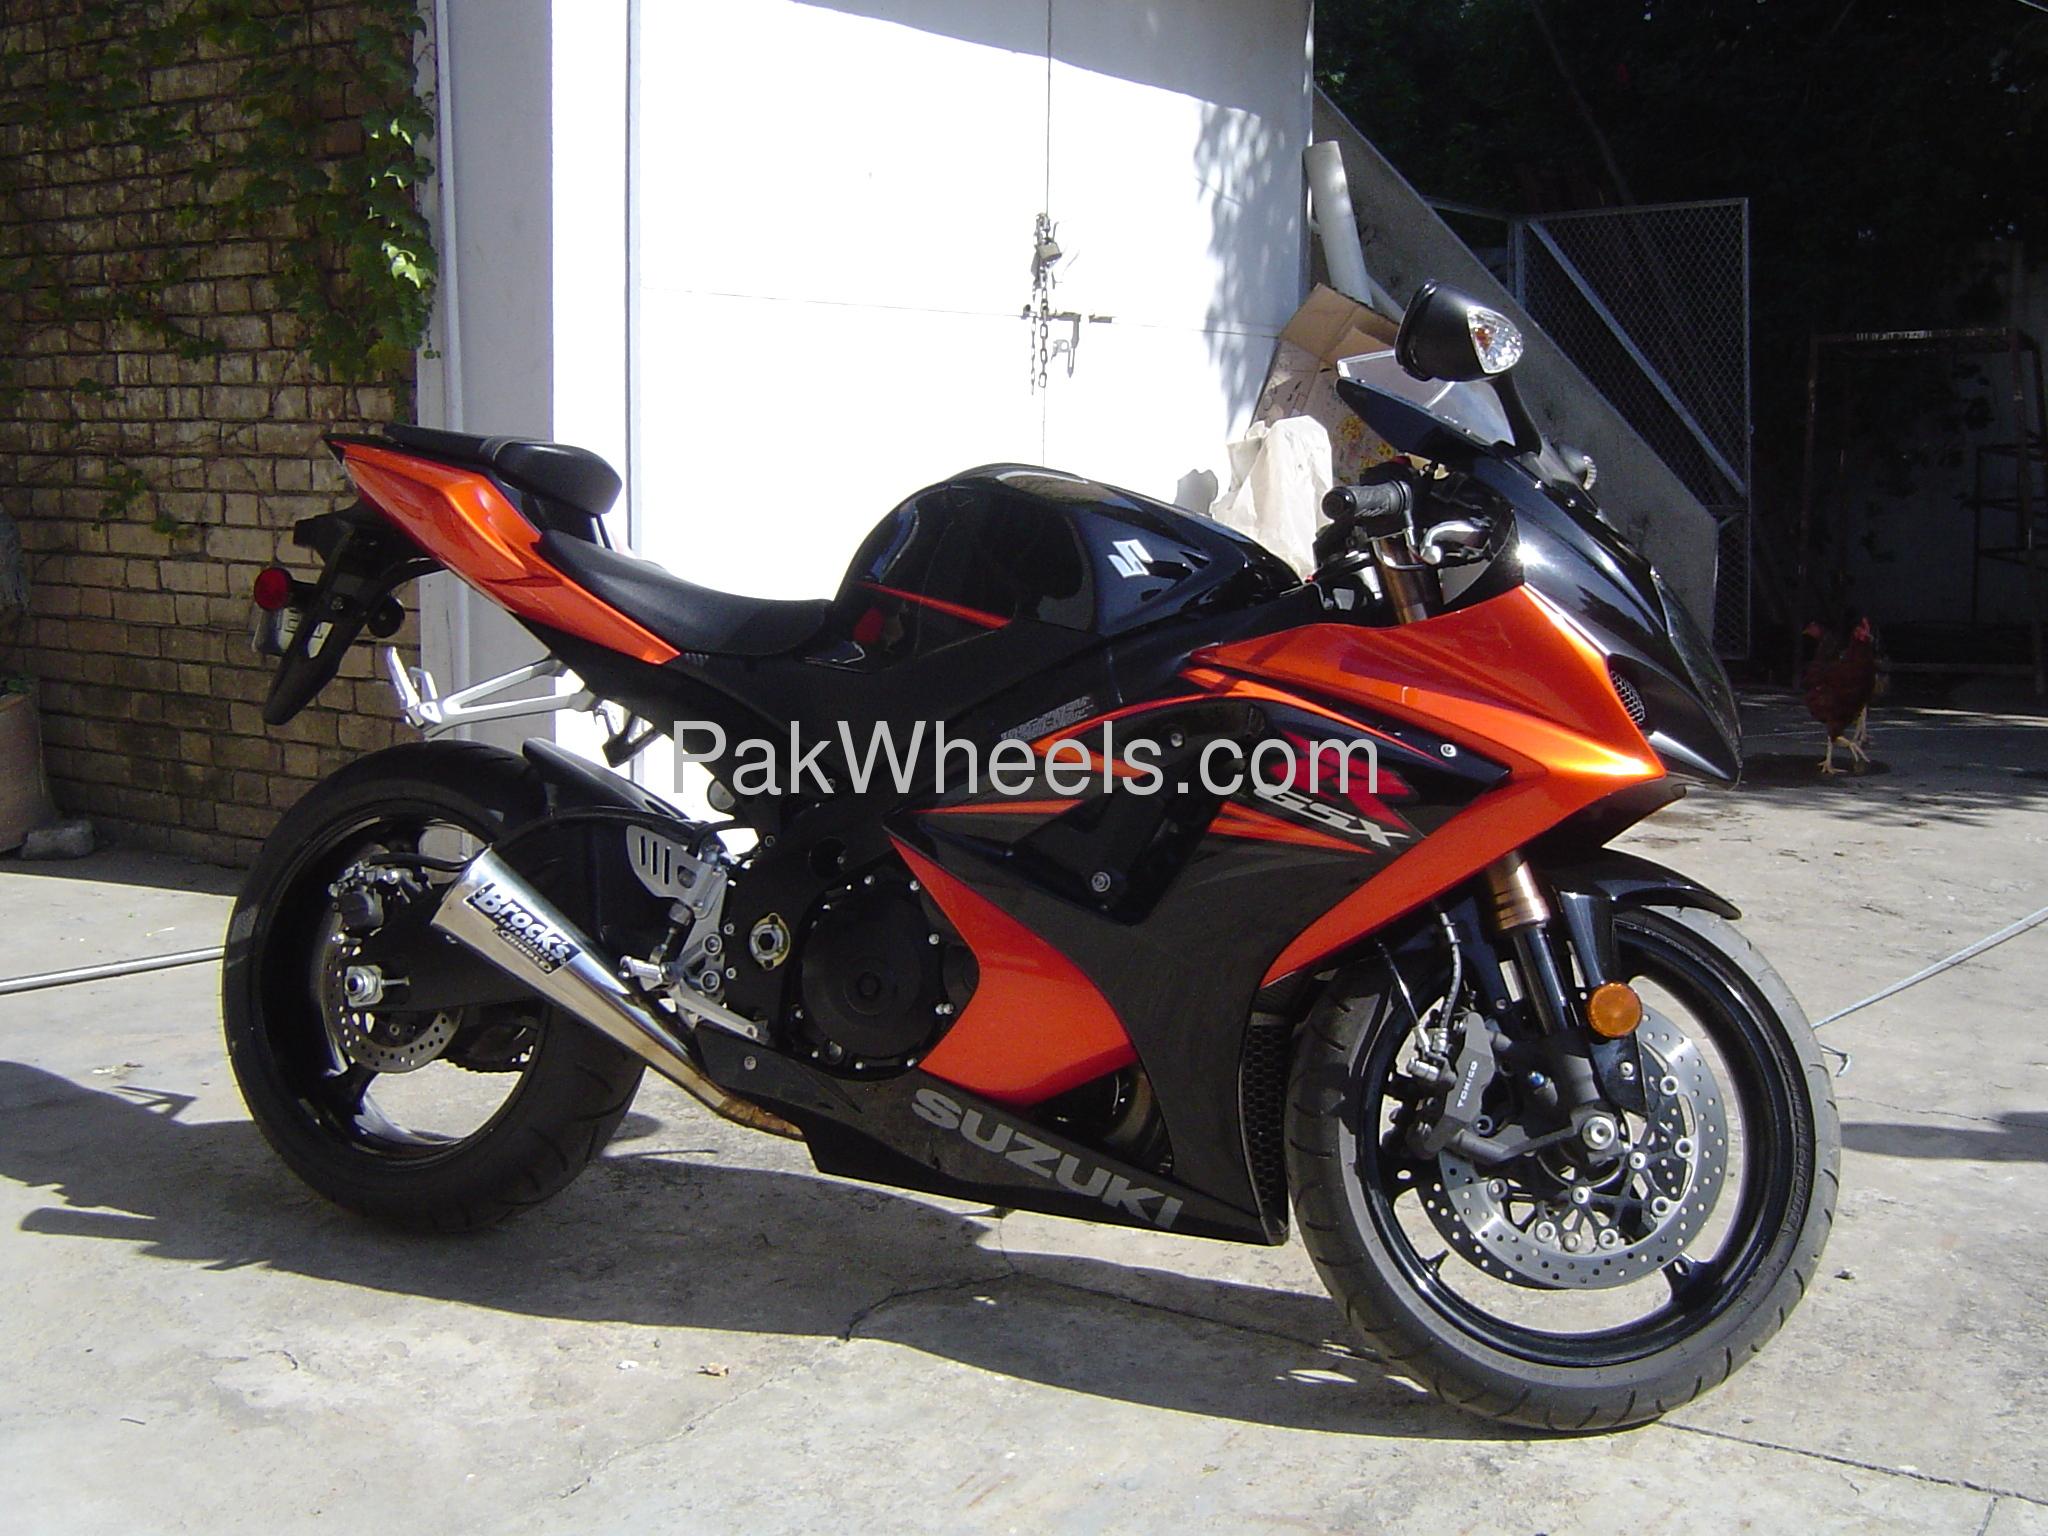 used suzuki gsx r1000 2008 bike for sale in islamabad 93185 pakwheels. Black Bedroom Furniture Sets. Home Design Ideas